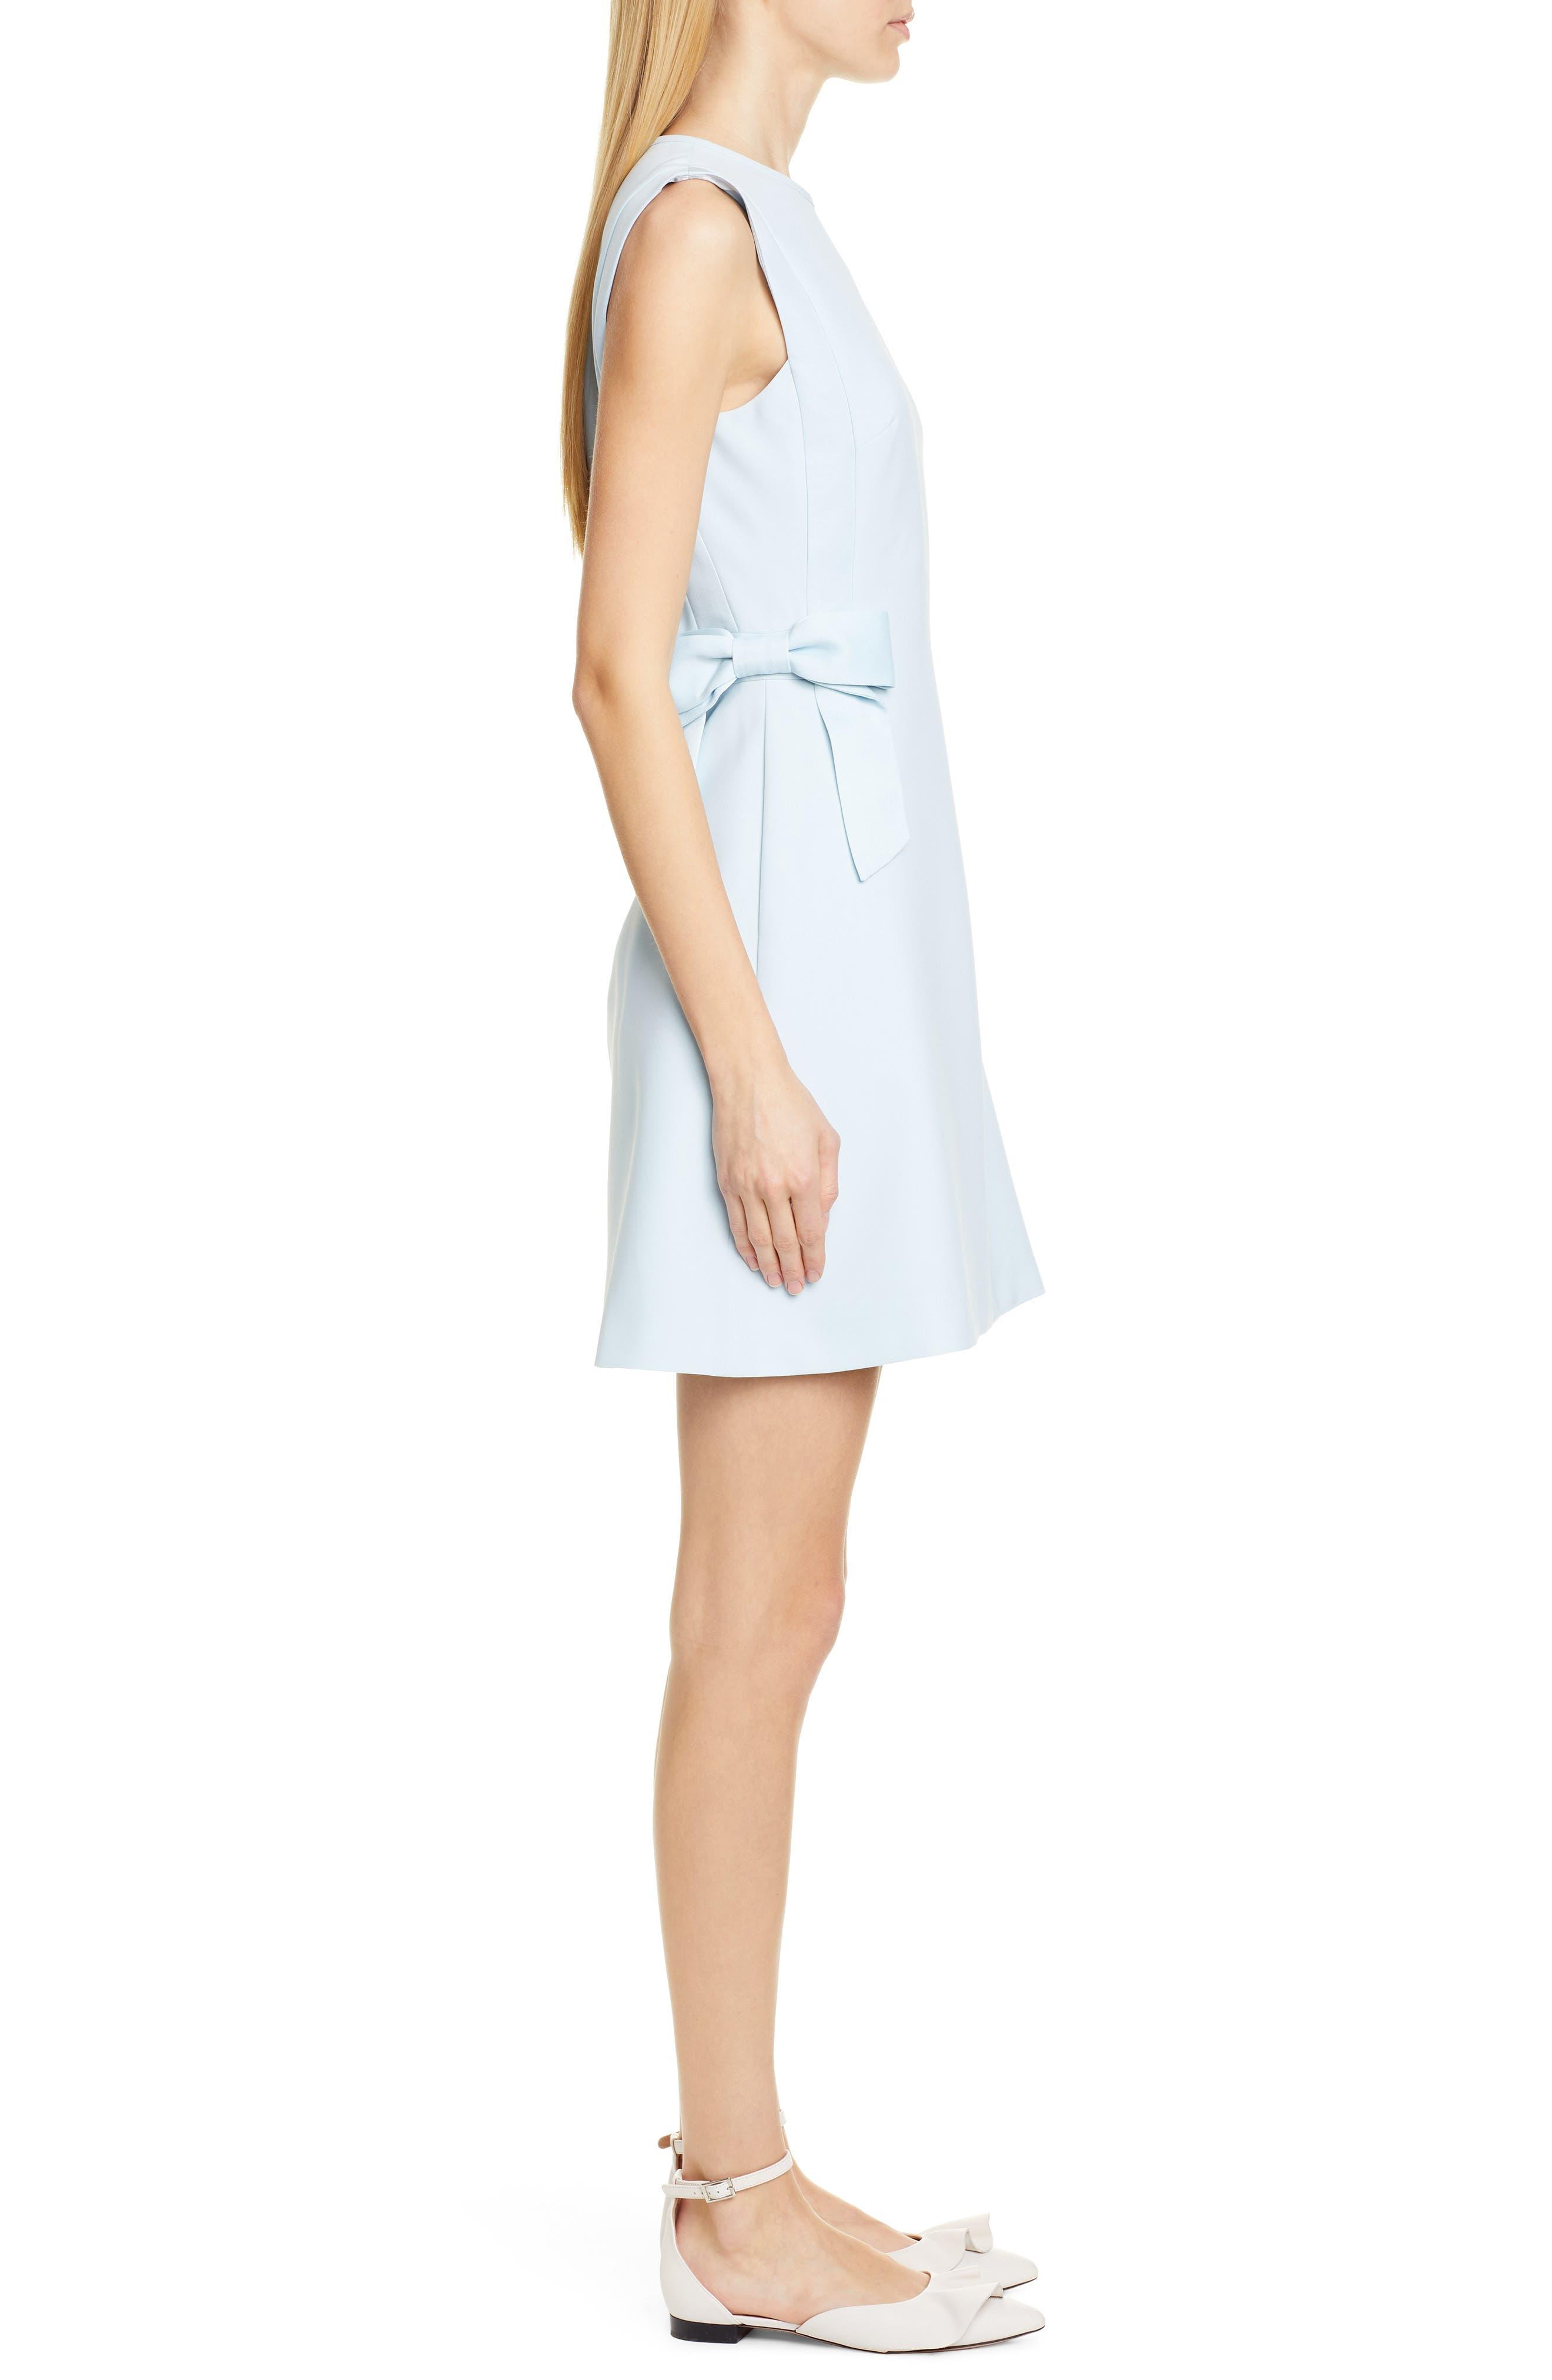 TED BAKER LONDON, Meline Side Bow Detail Dress, Alternate thumbnail 4, color, MINT